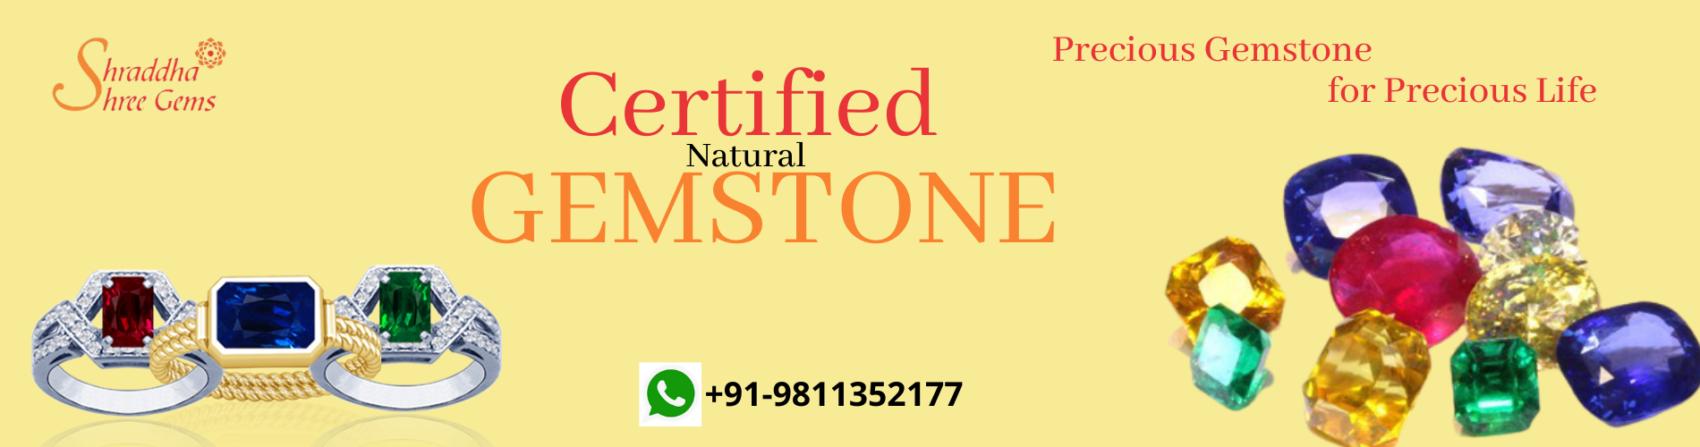 Buy 100% Natural Wholesale Gemstone At Affordable Price